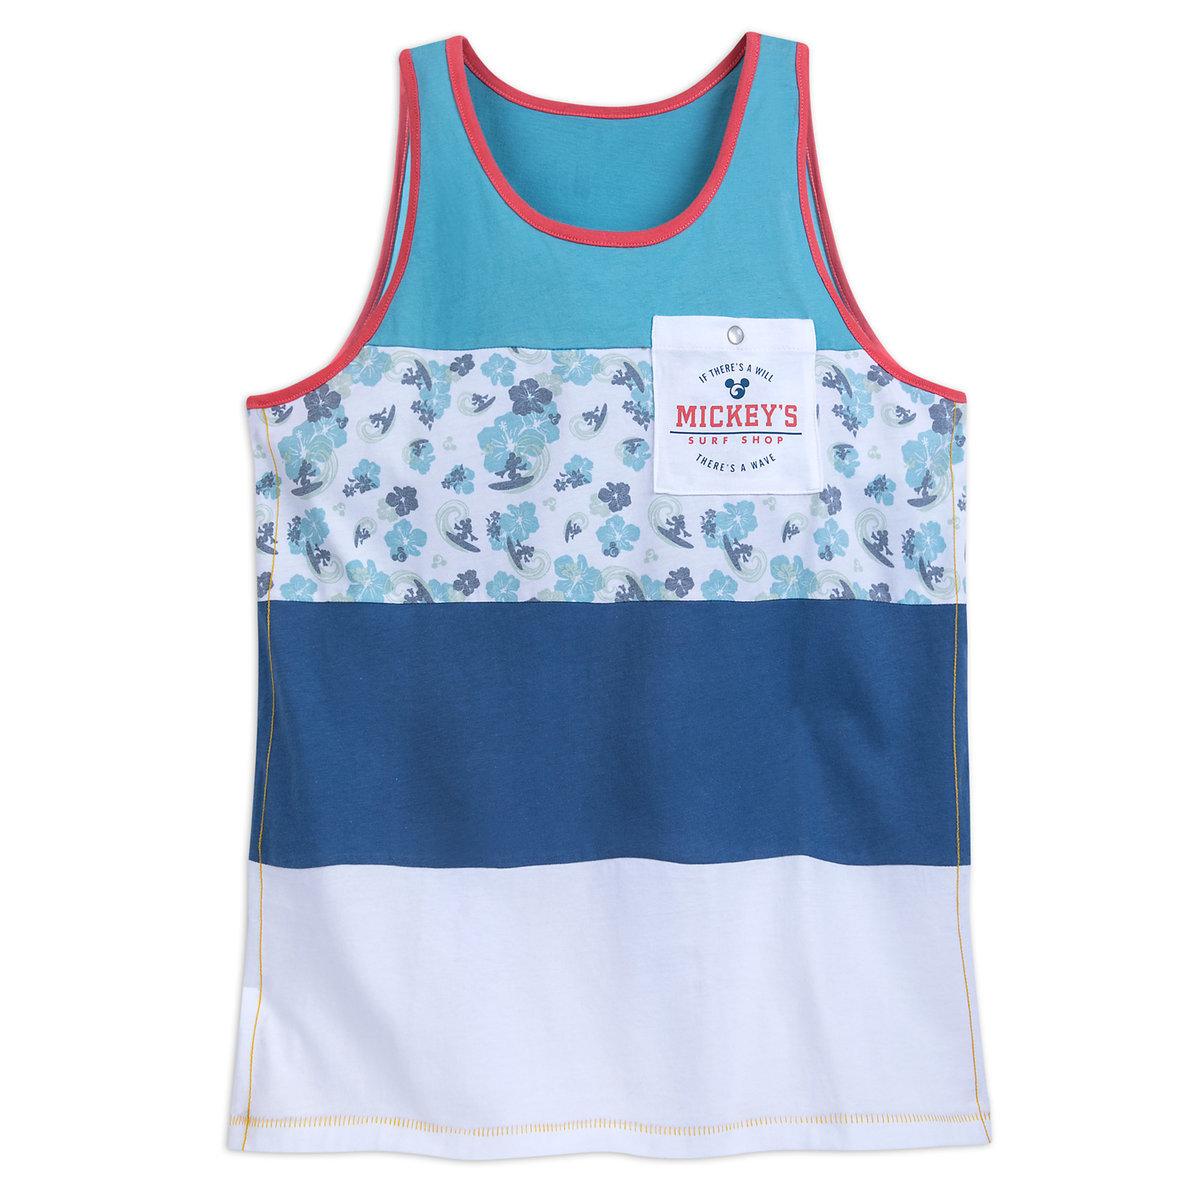 4dac65da4d2cb2 Disney mens shirt mickey surf shop tank top if theres a will jpg 1200x1200 Disney  mens